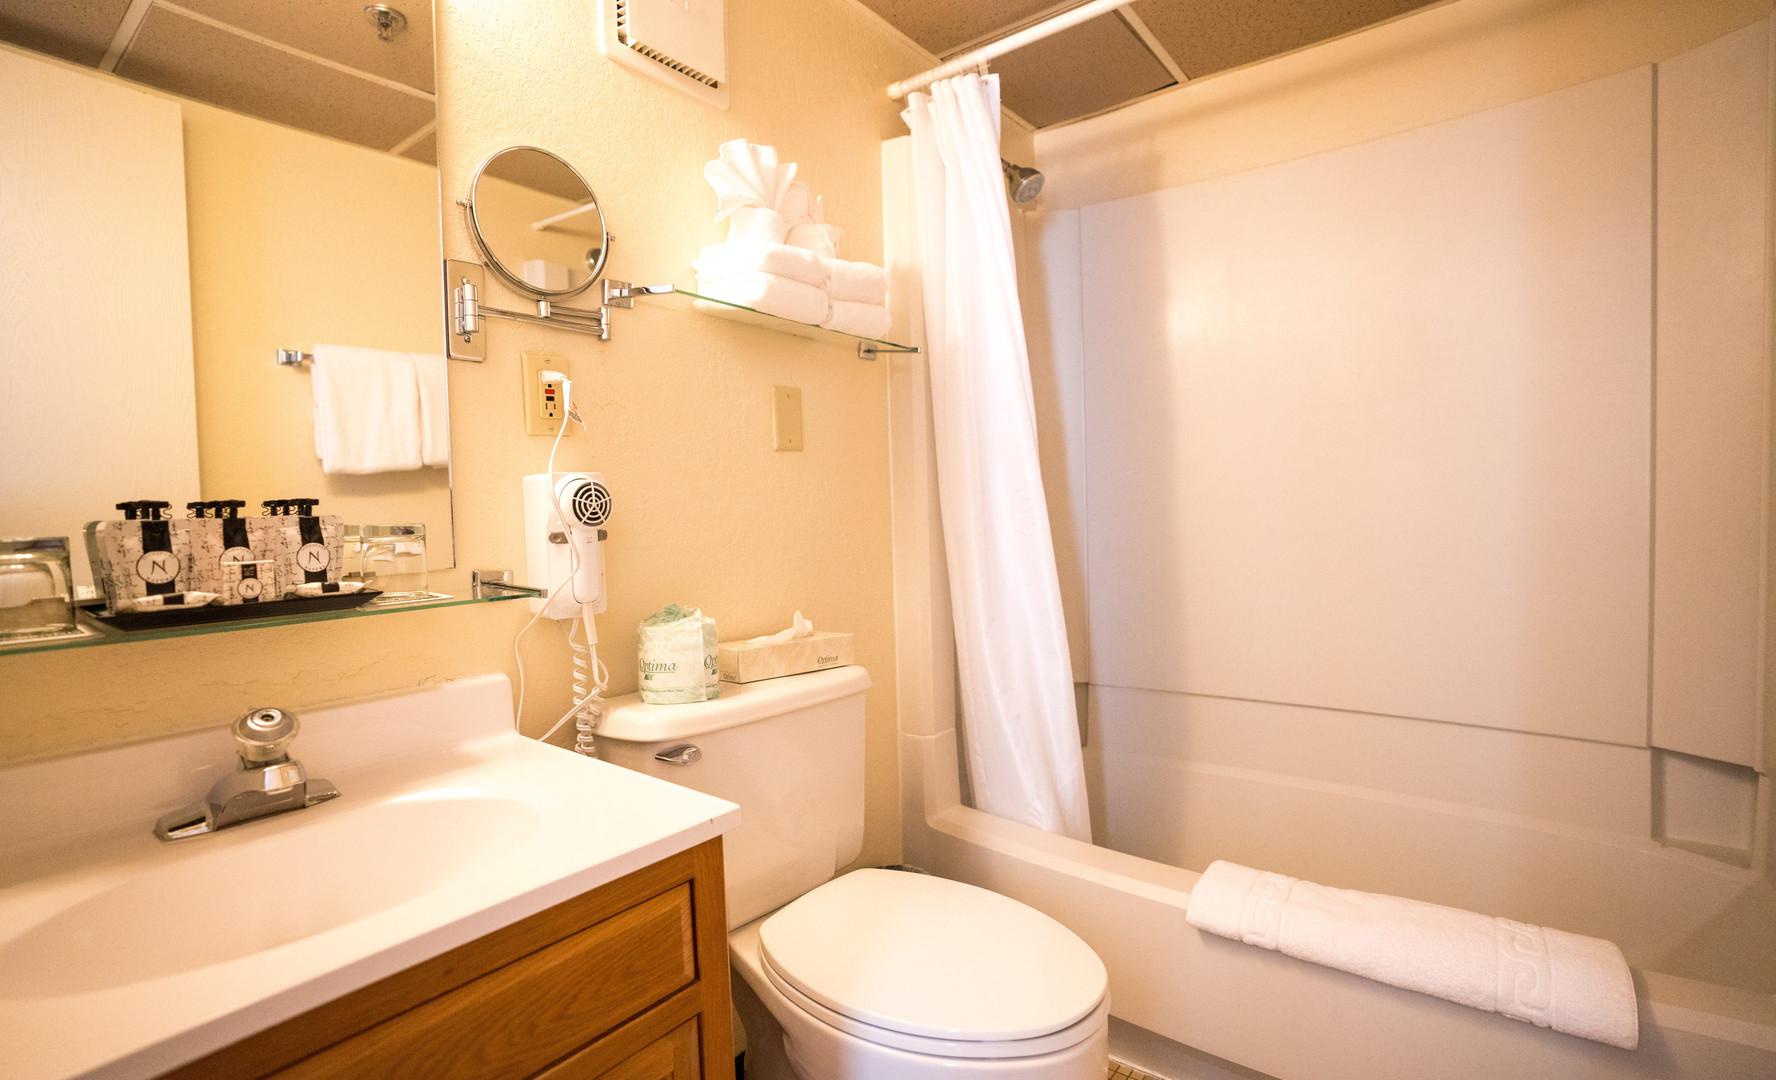 DQ Bathroom.jpg